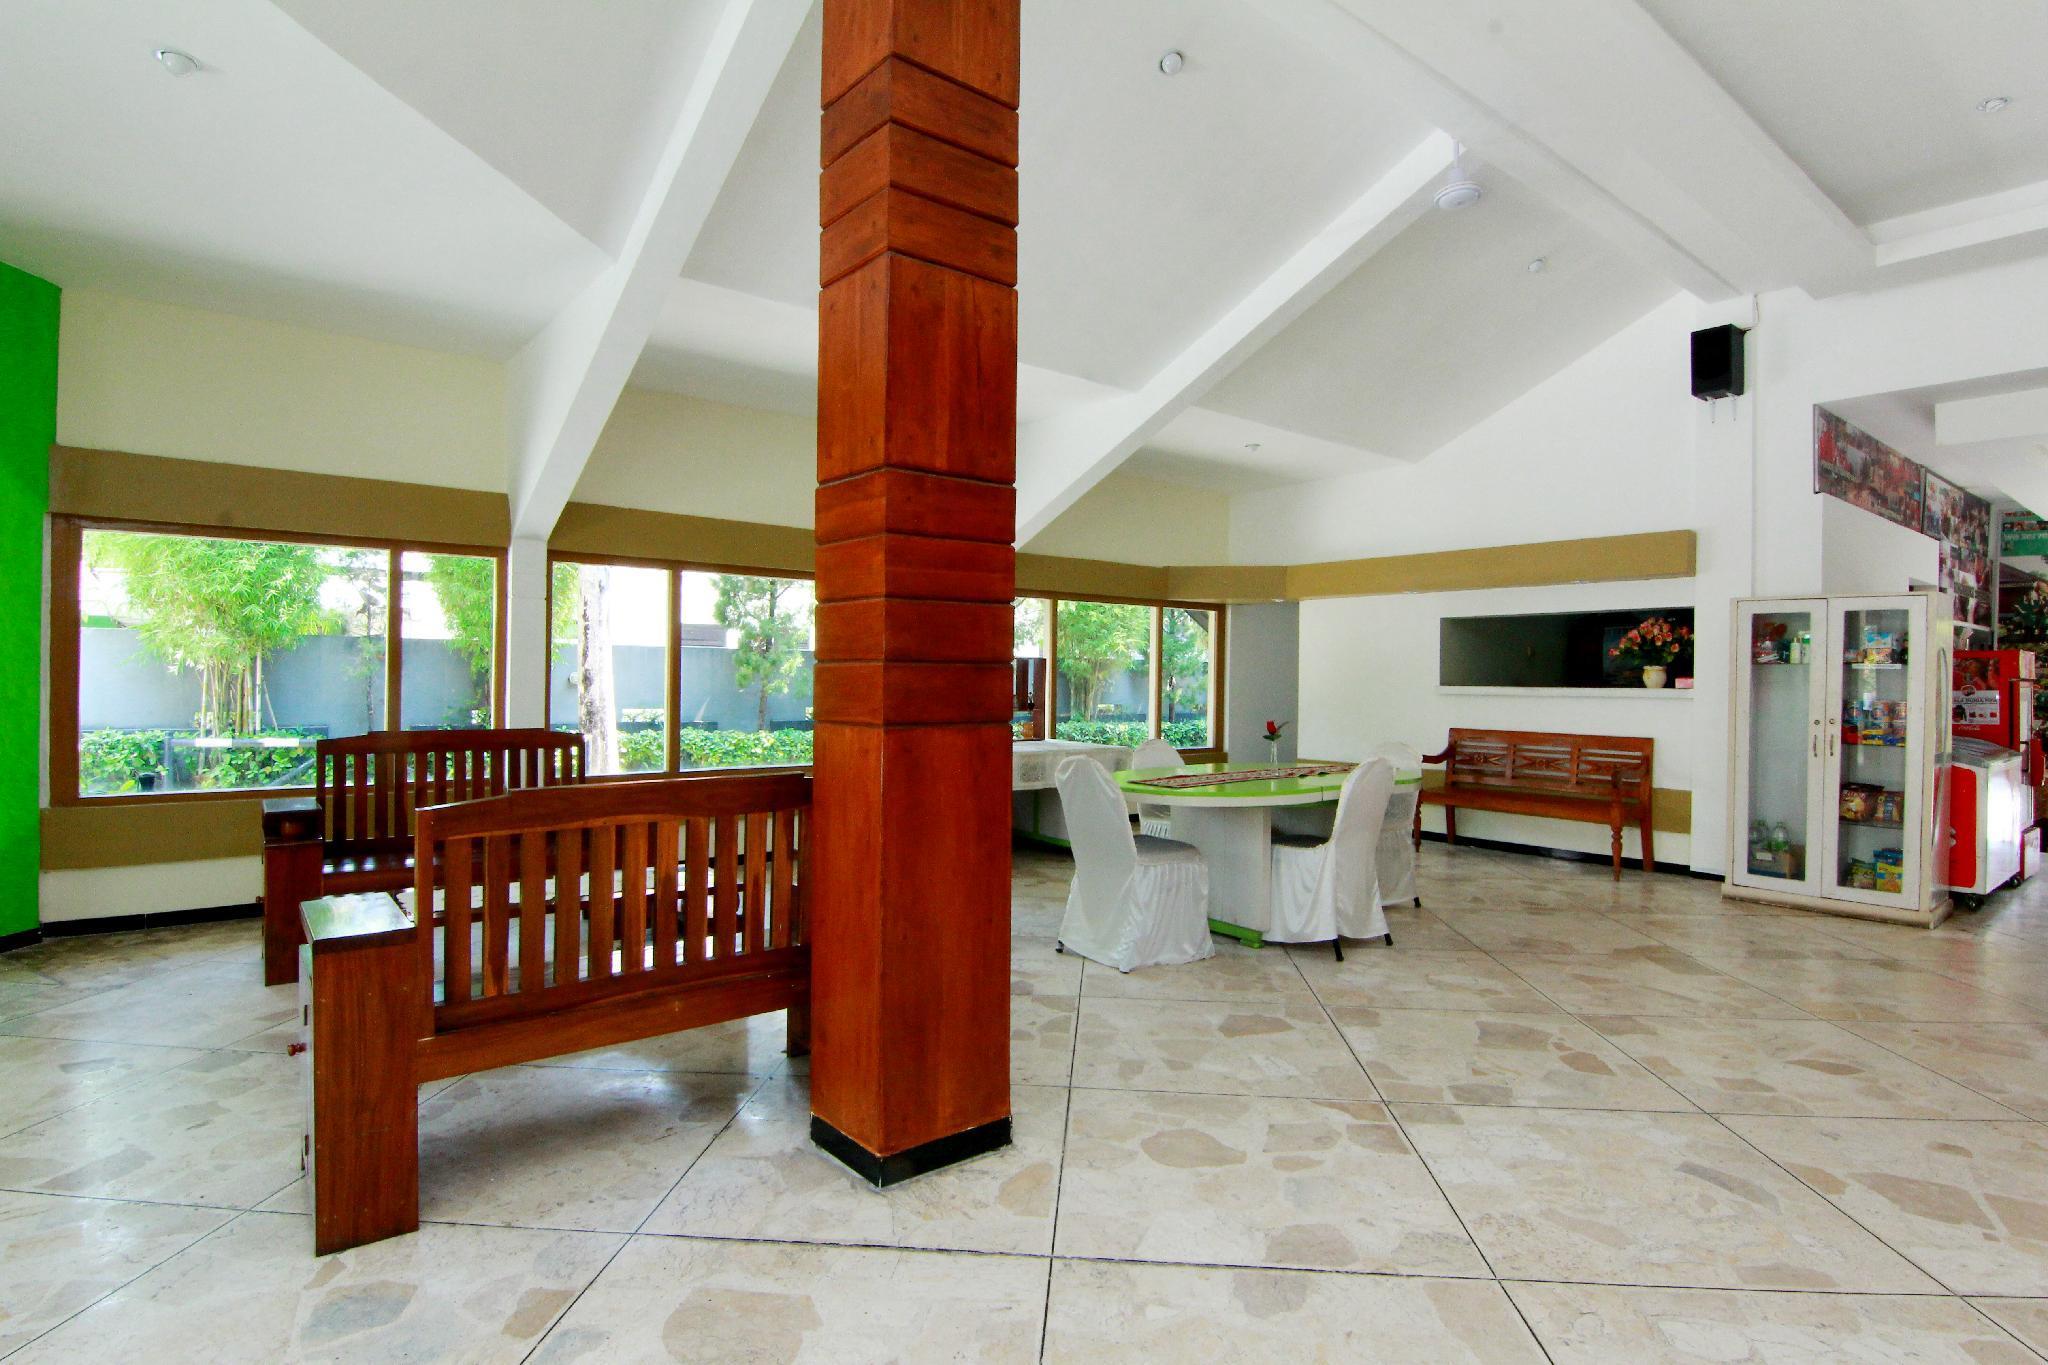 The Soemarsono Yogyakarta Hotel